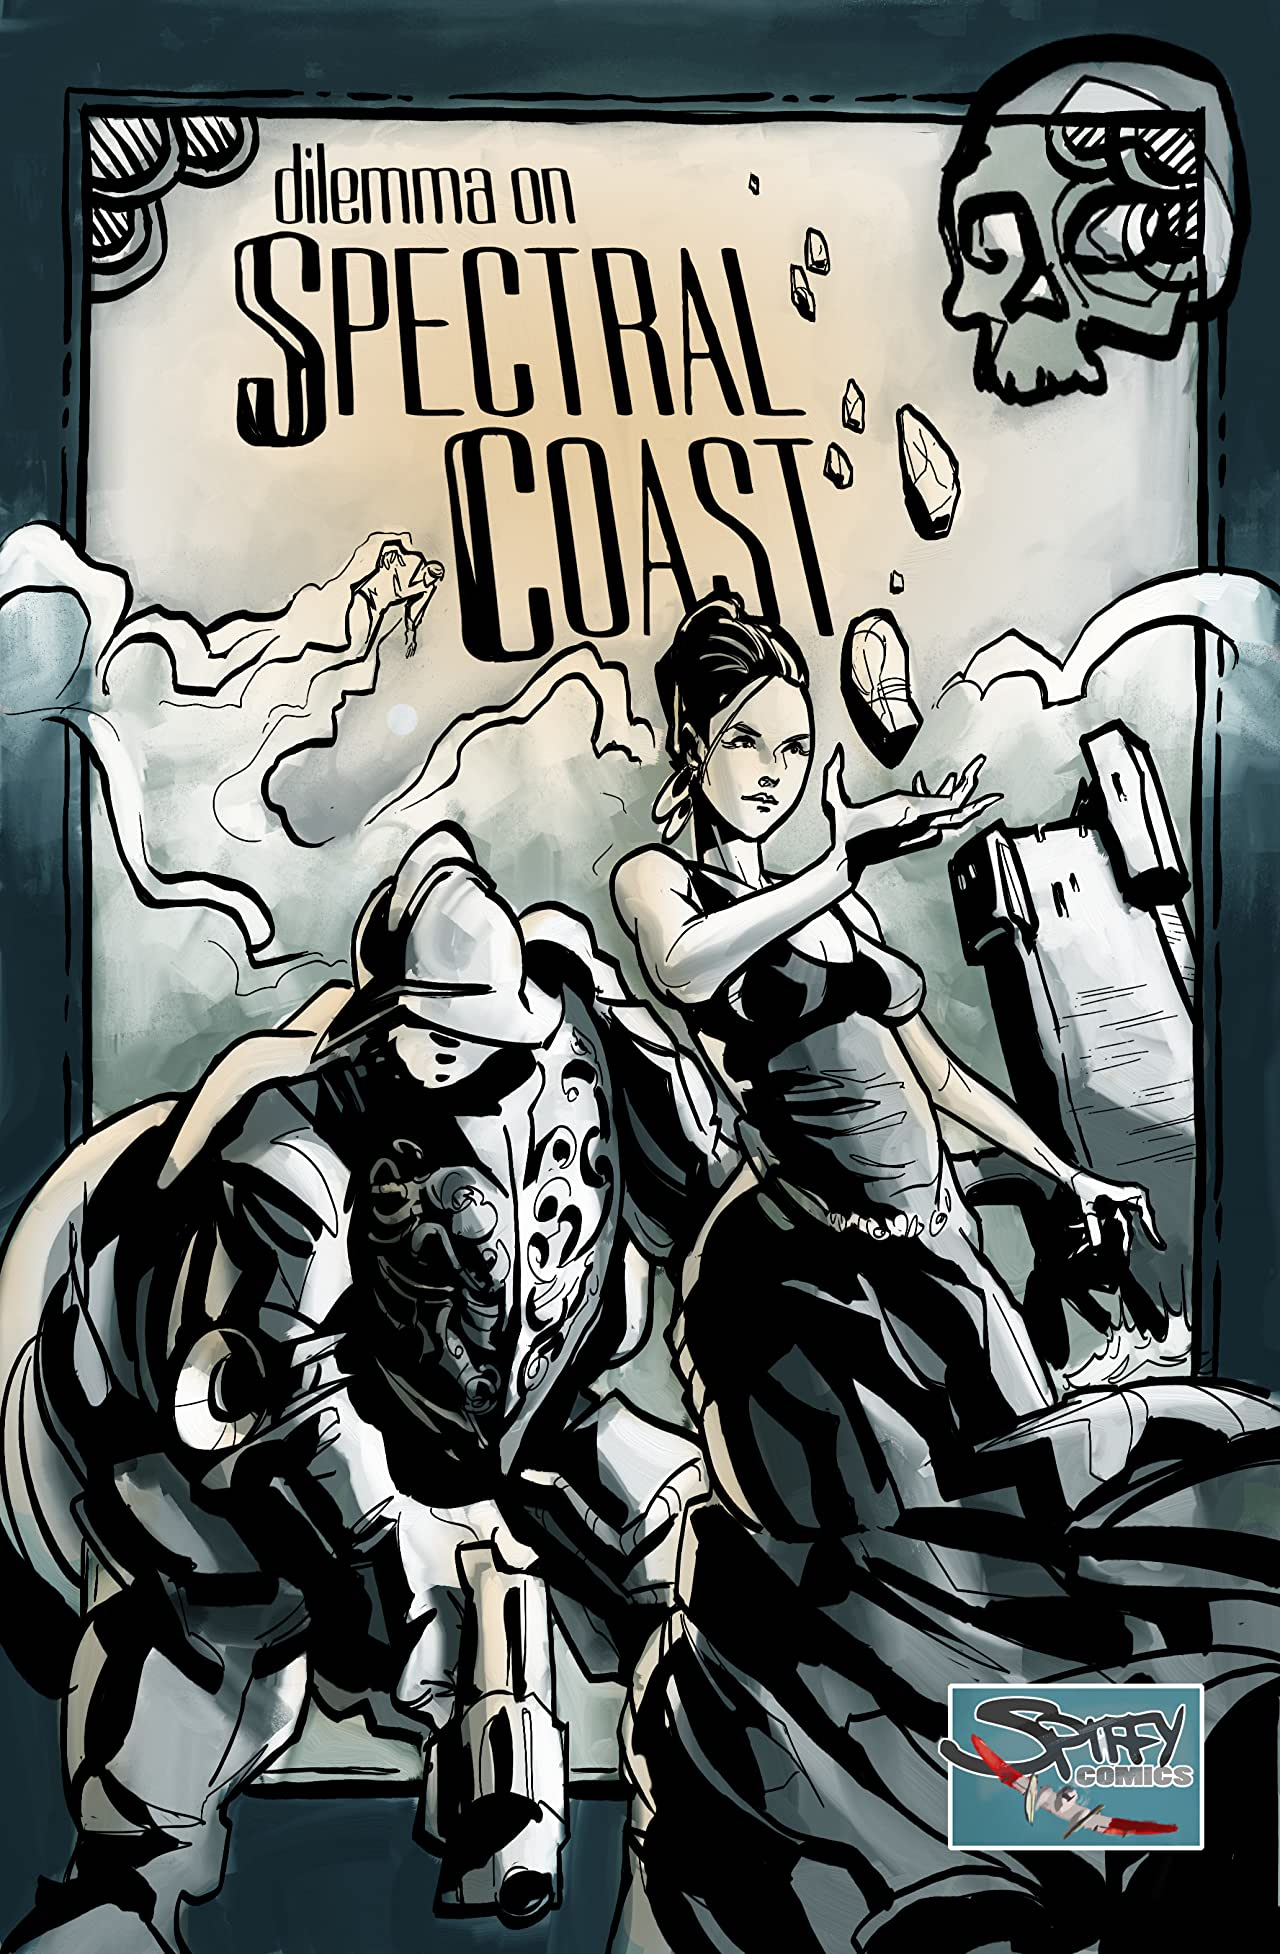 Dilemma on Spectral Coast